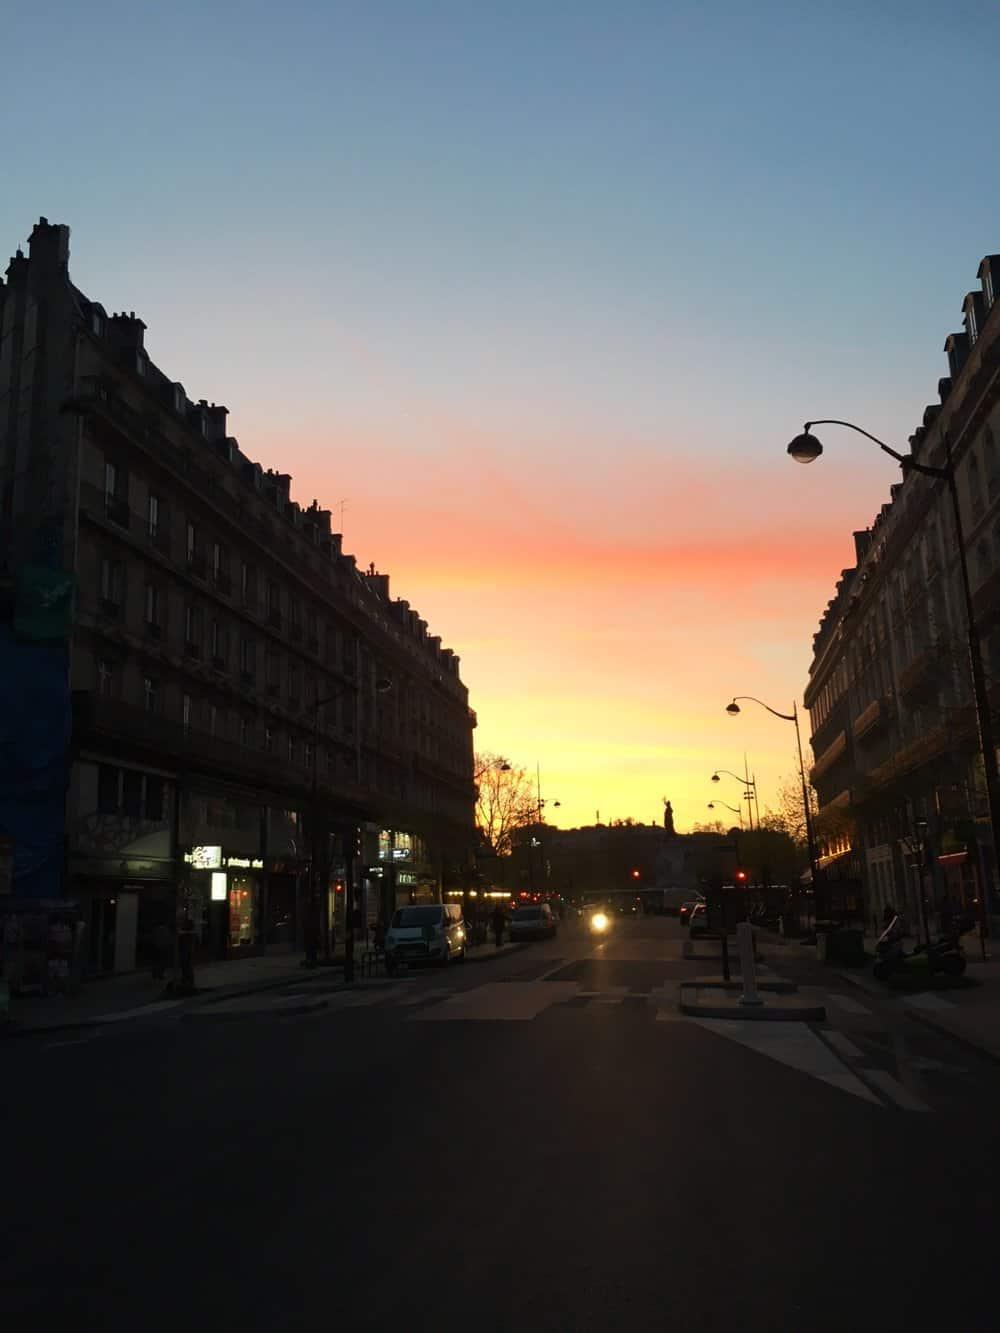 sunset in paris france